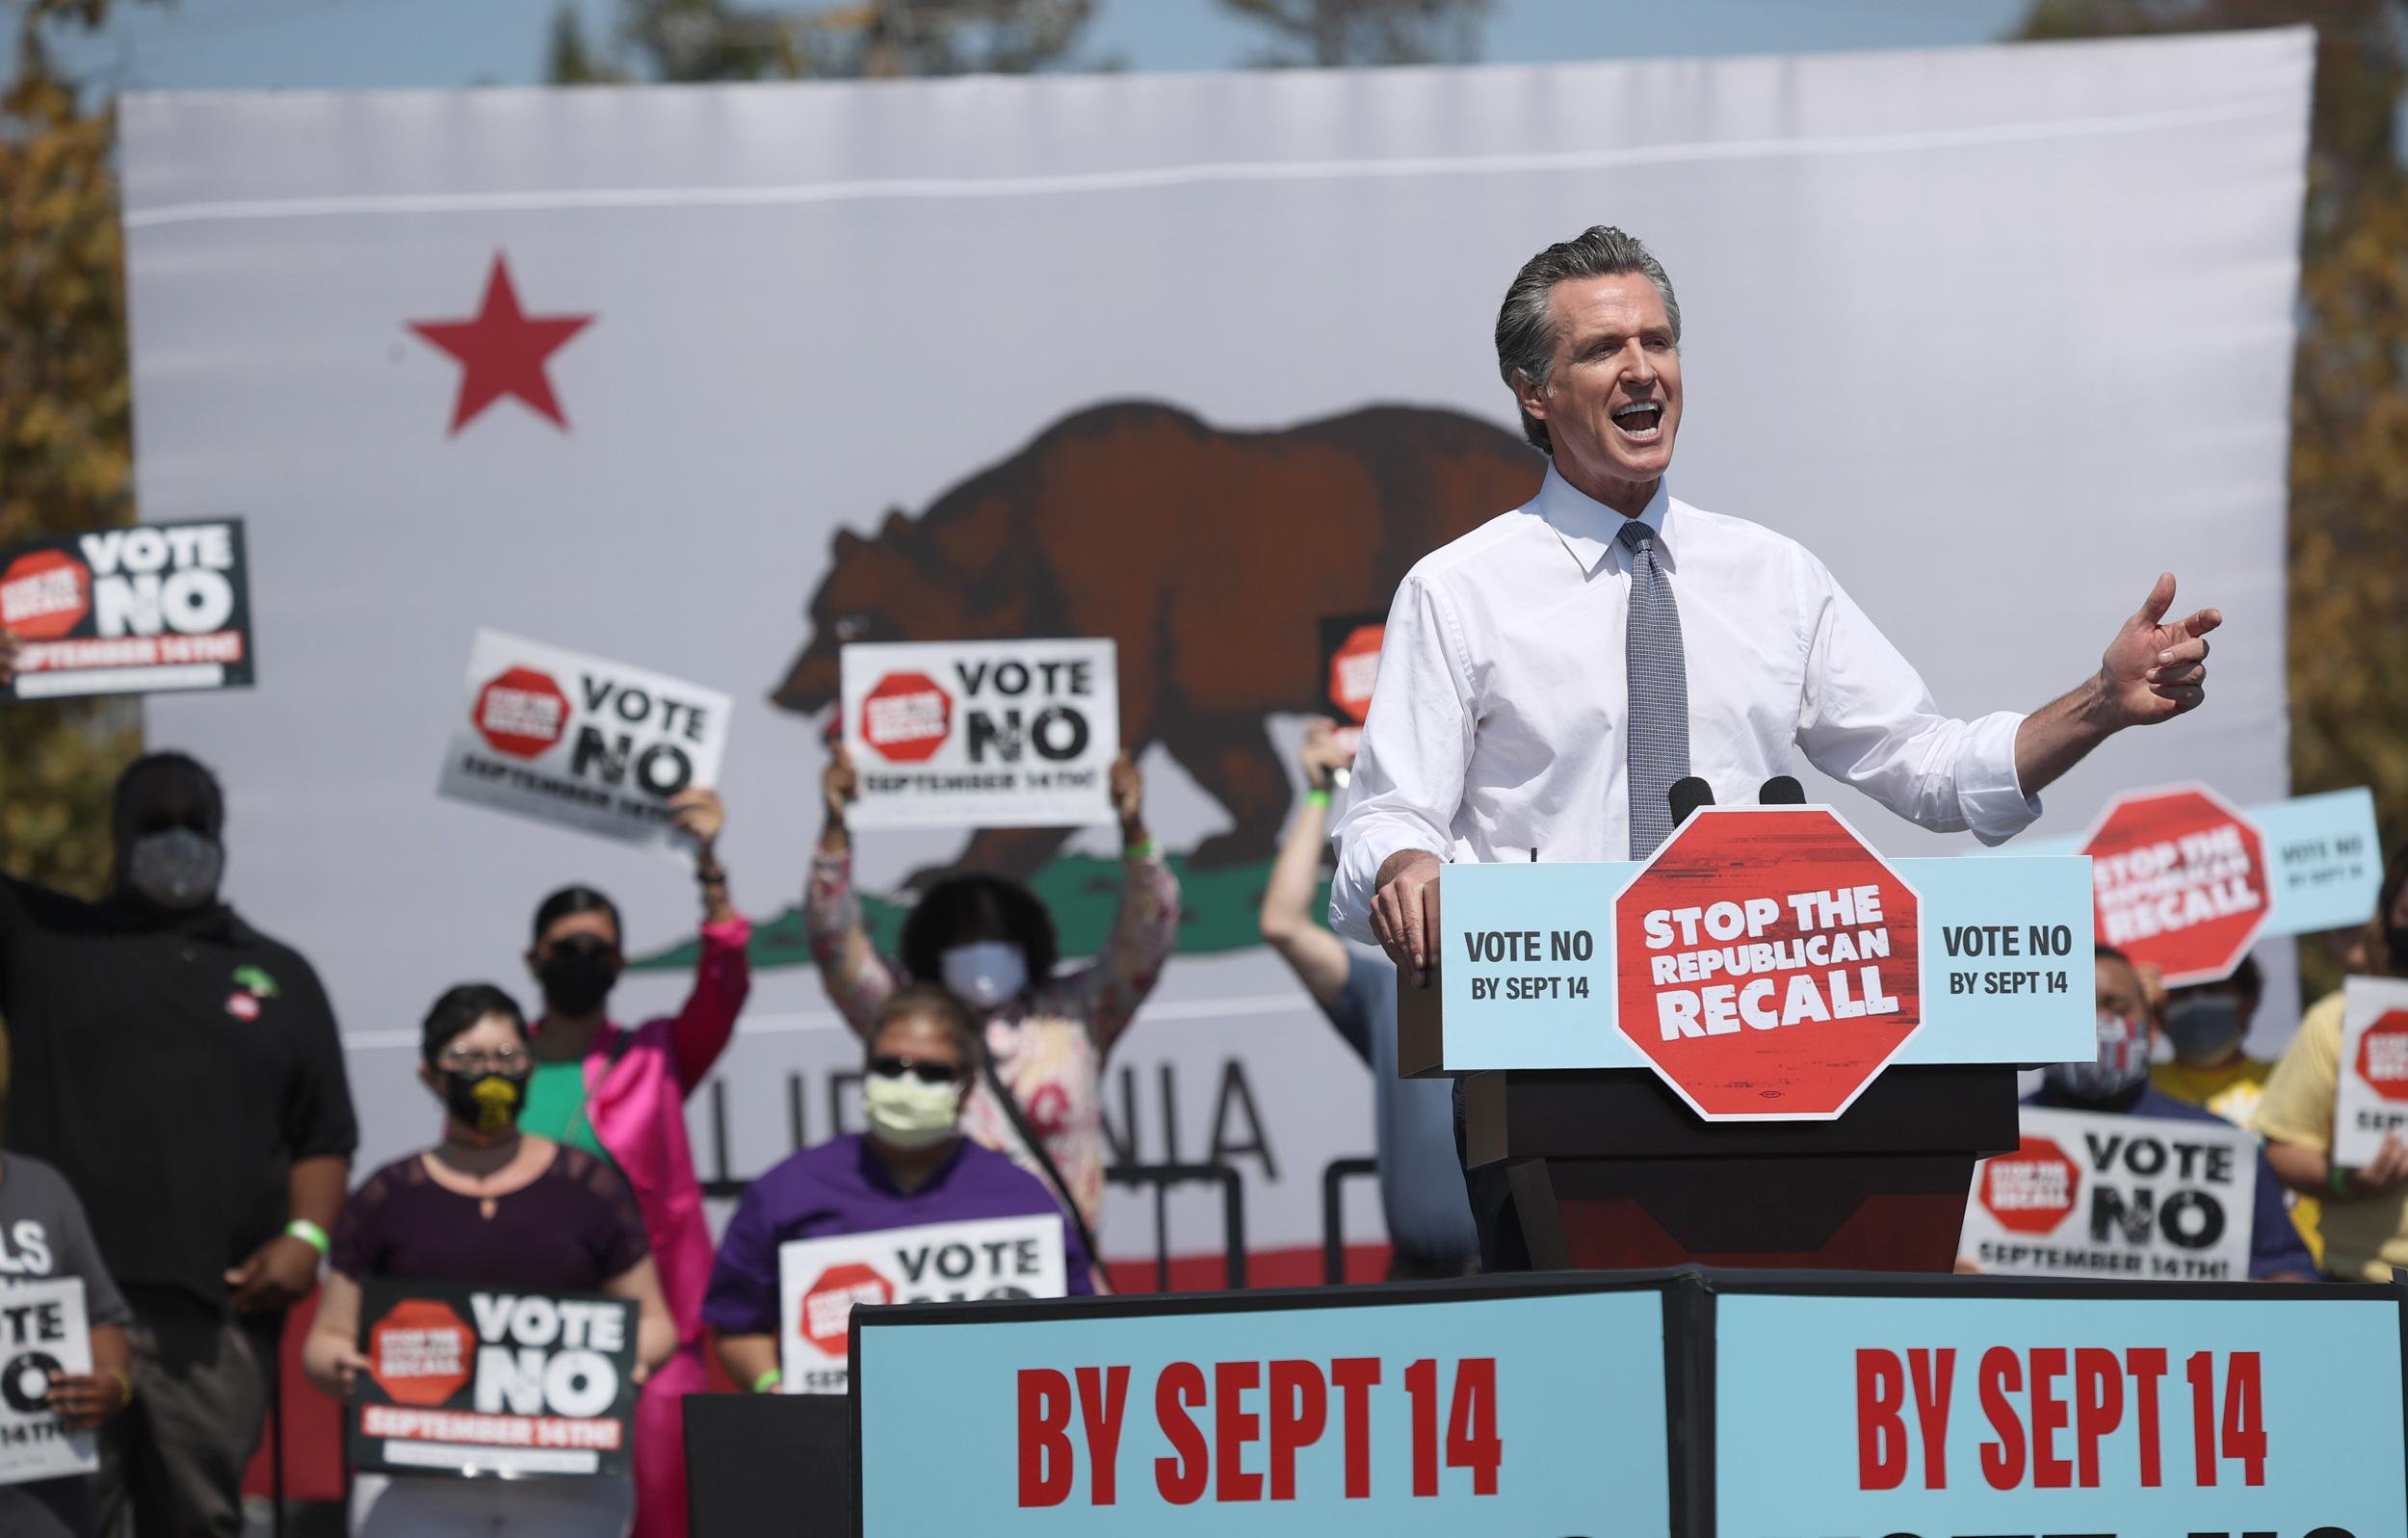 Biden to campaign for California Gov. Gavin Newsom on eve of recall vote